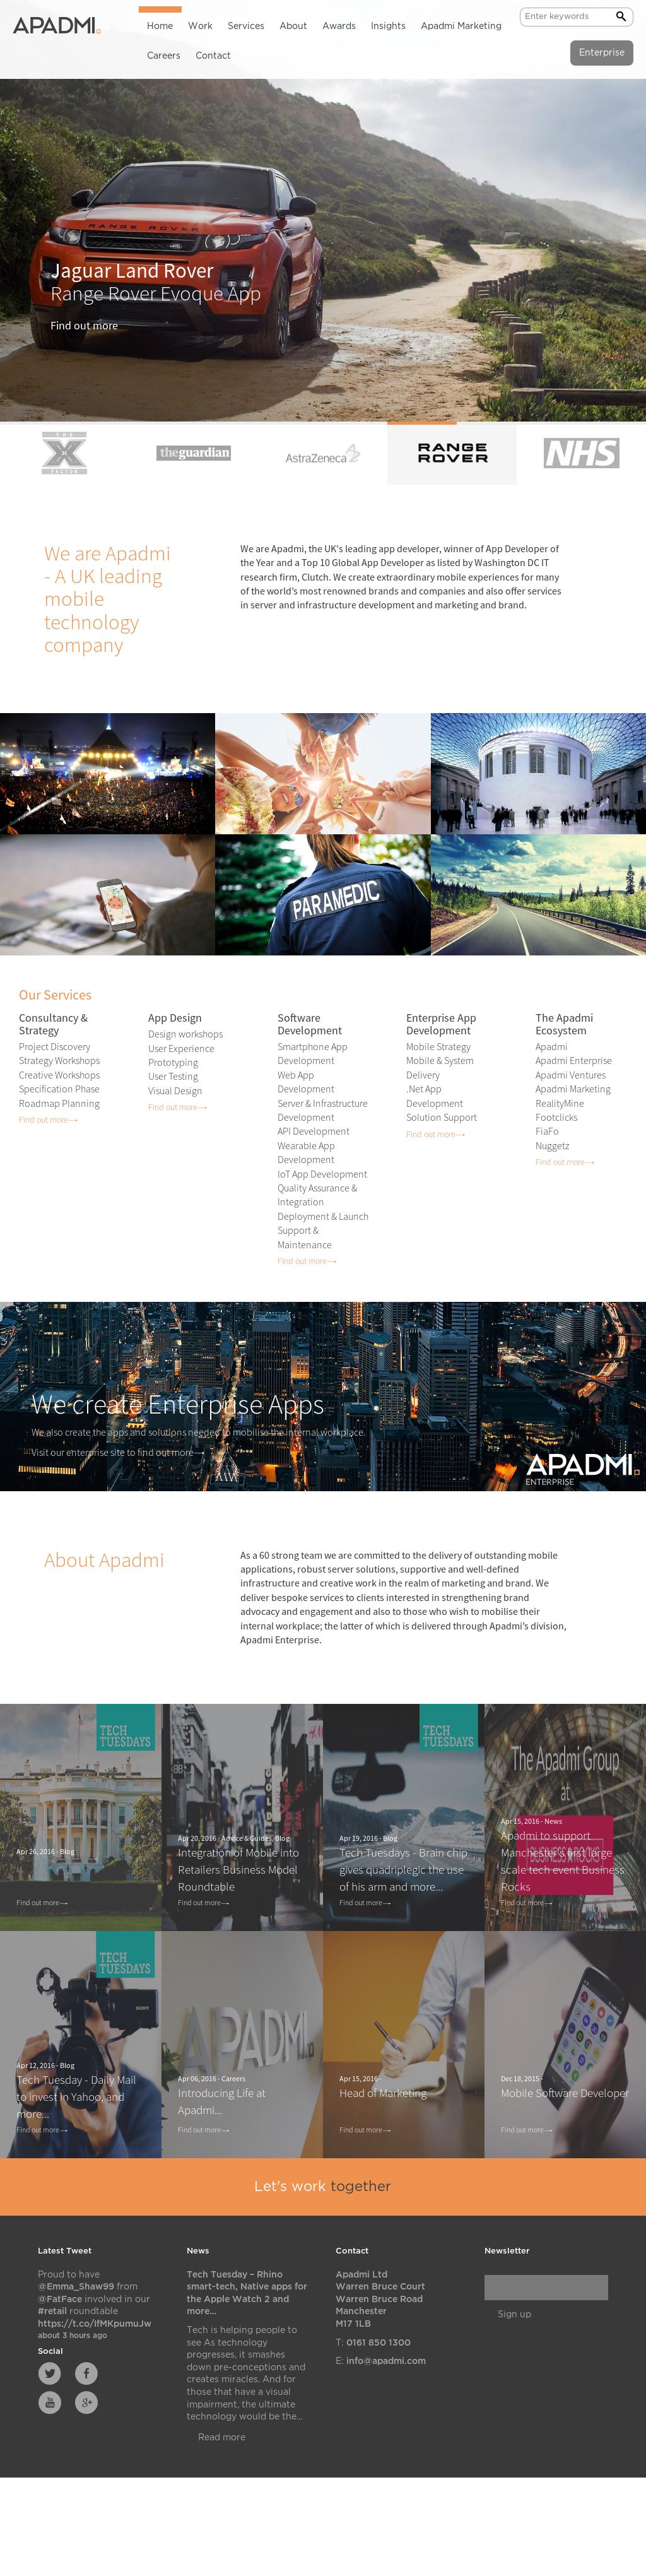 Apadmi Competitors, Revenue and Employees - Owler Company